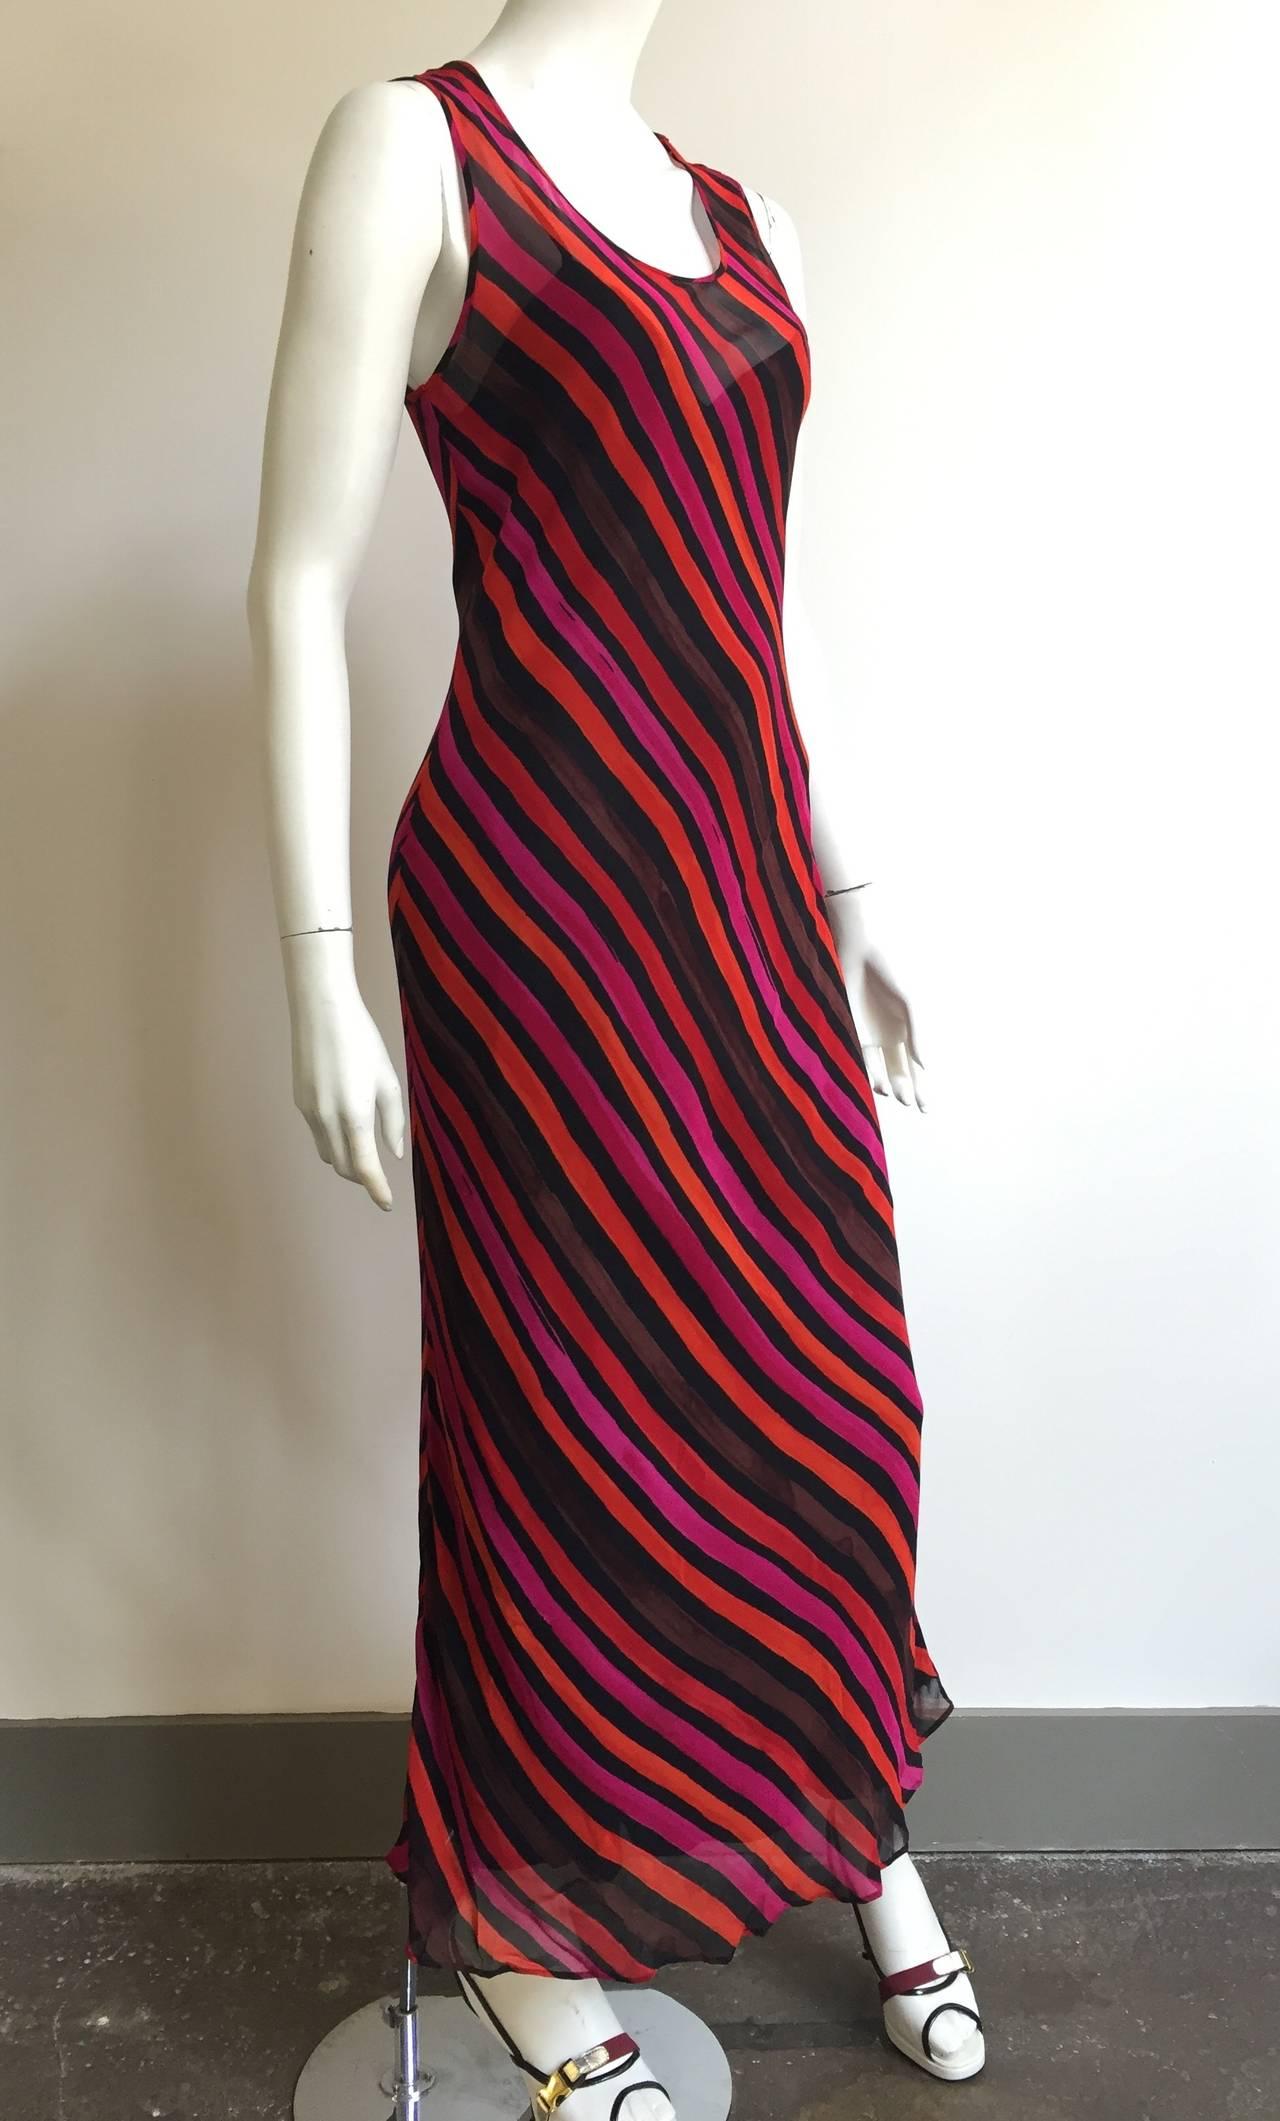 Women's Sonia Rykiel  Striped Dress Size 4 / 6. For Sale